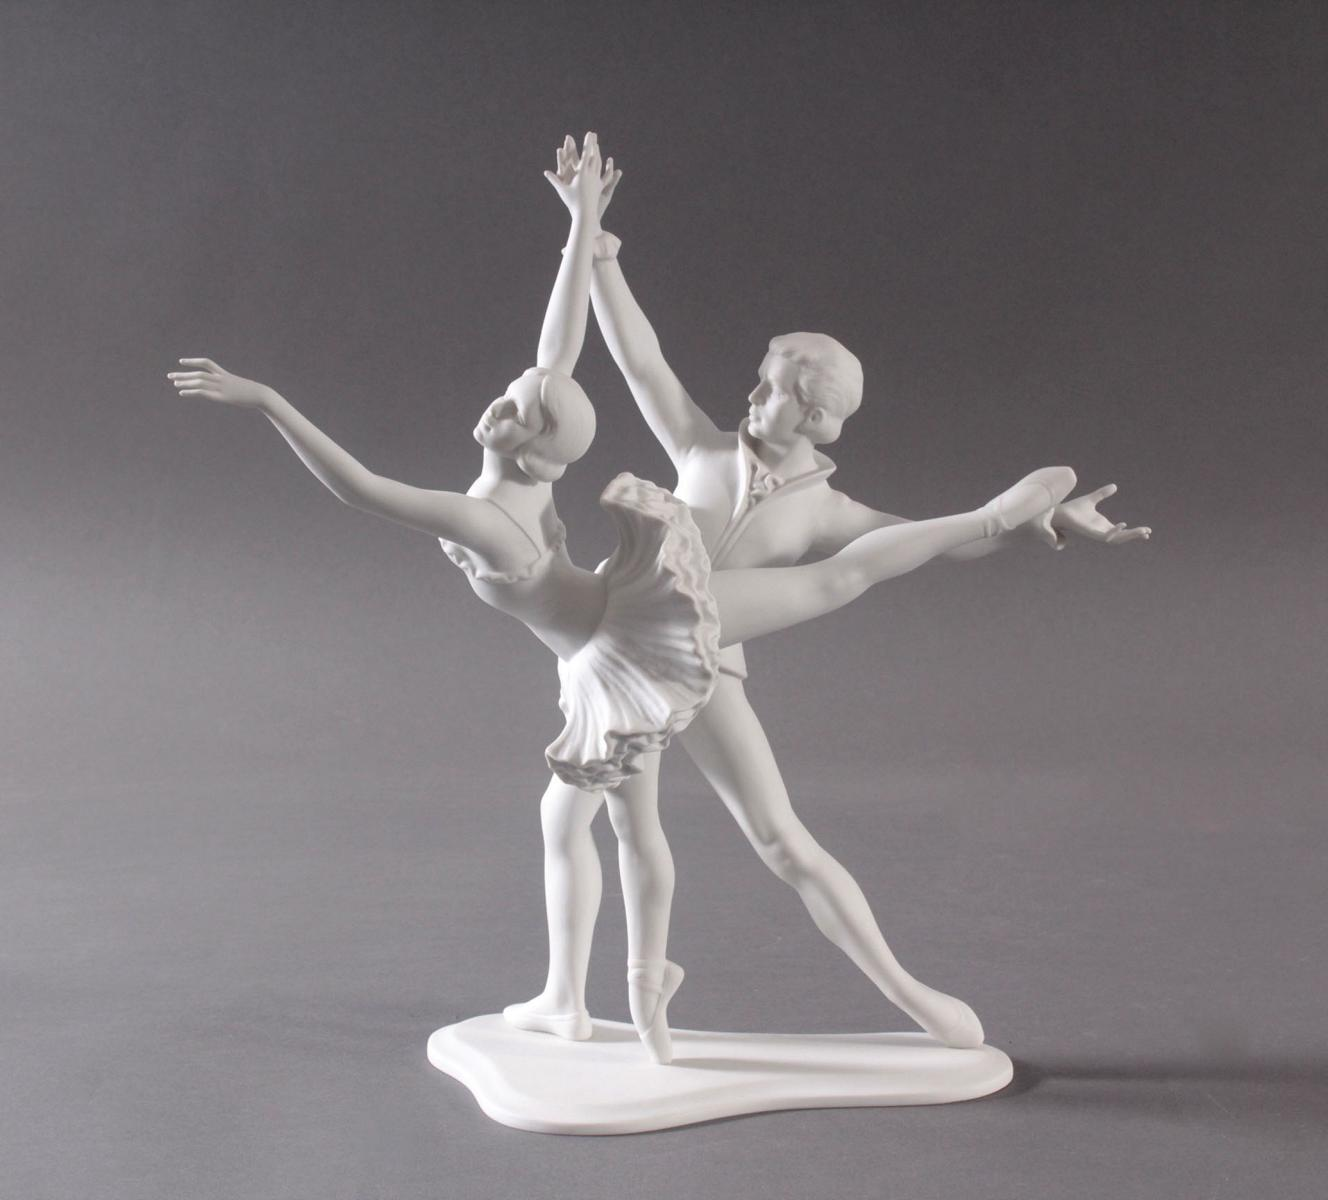 Goebel-Figur, 'Tanzendes Paar', 20. Jahrhundert-3